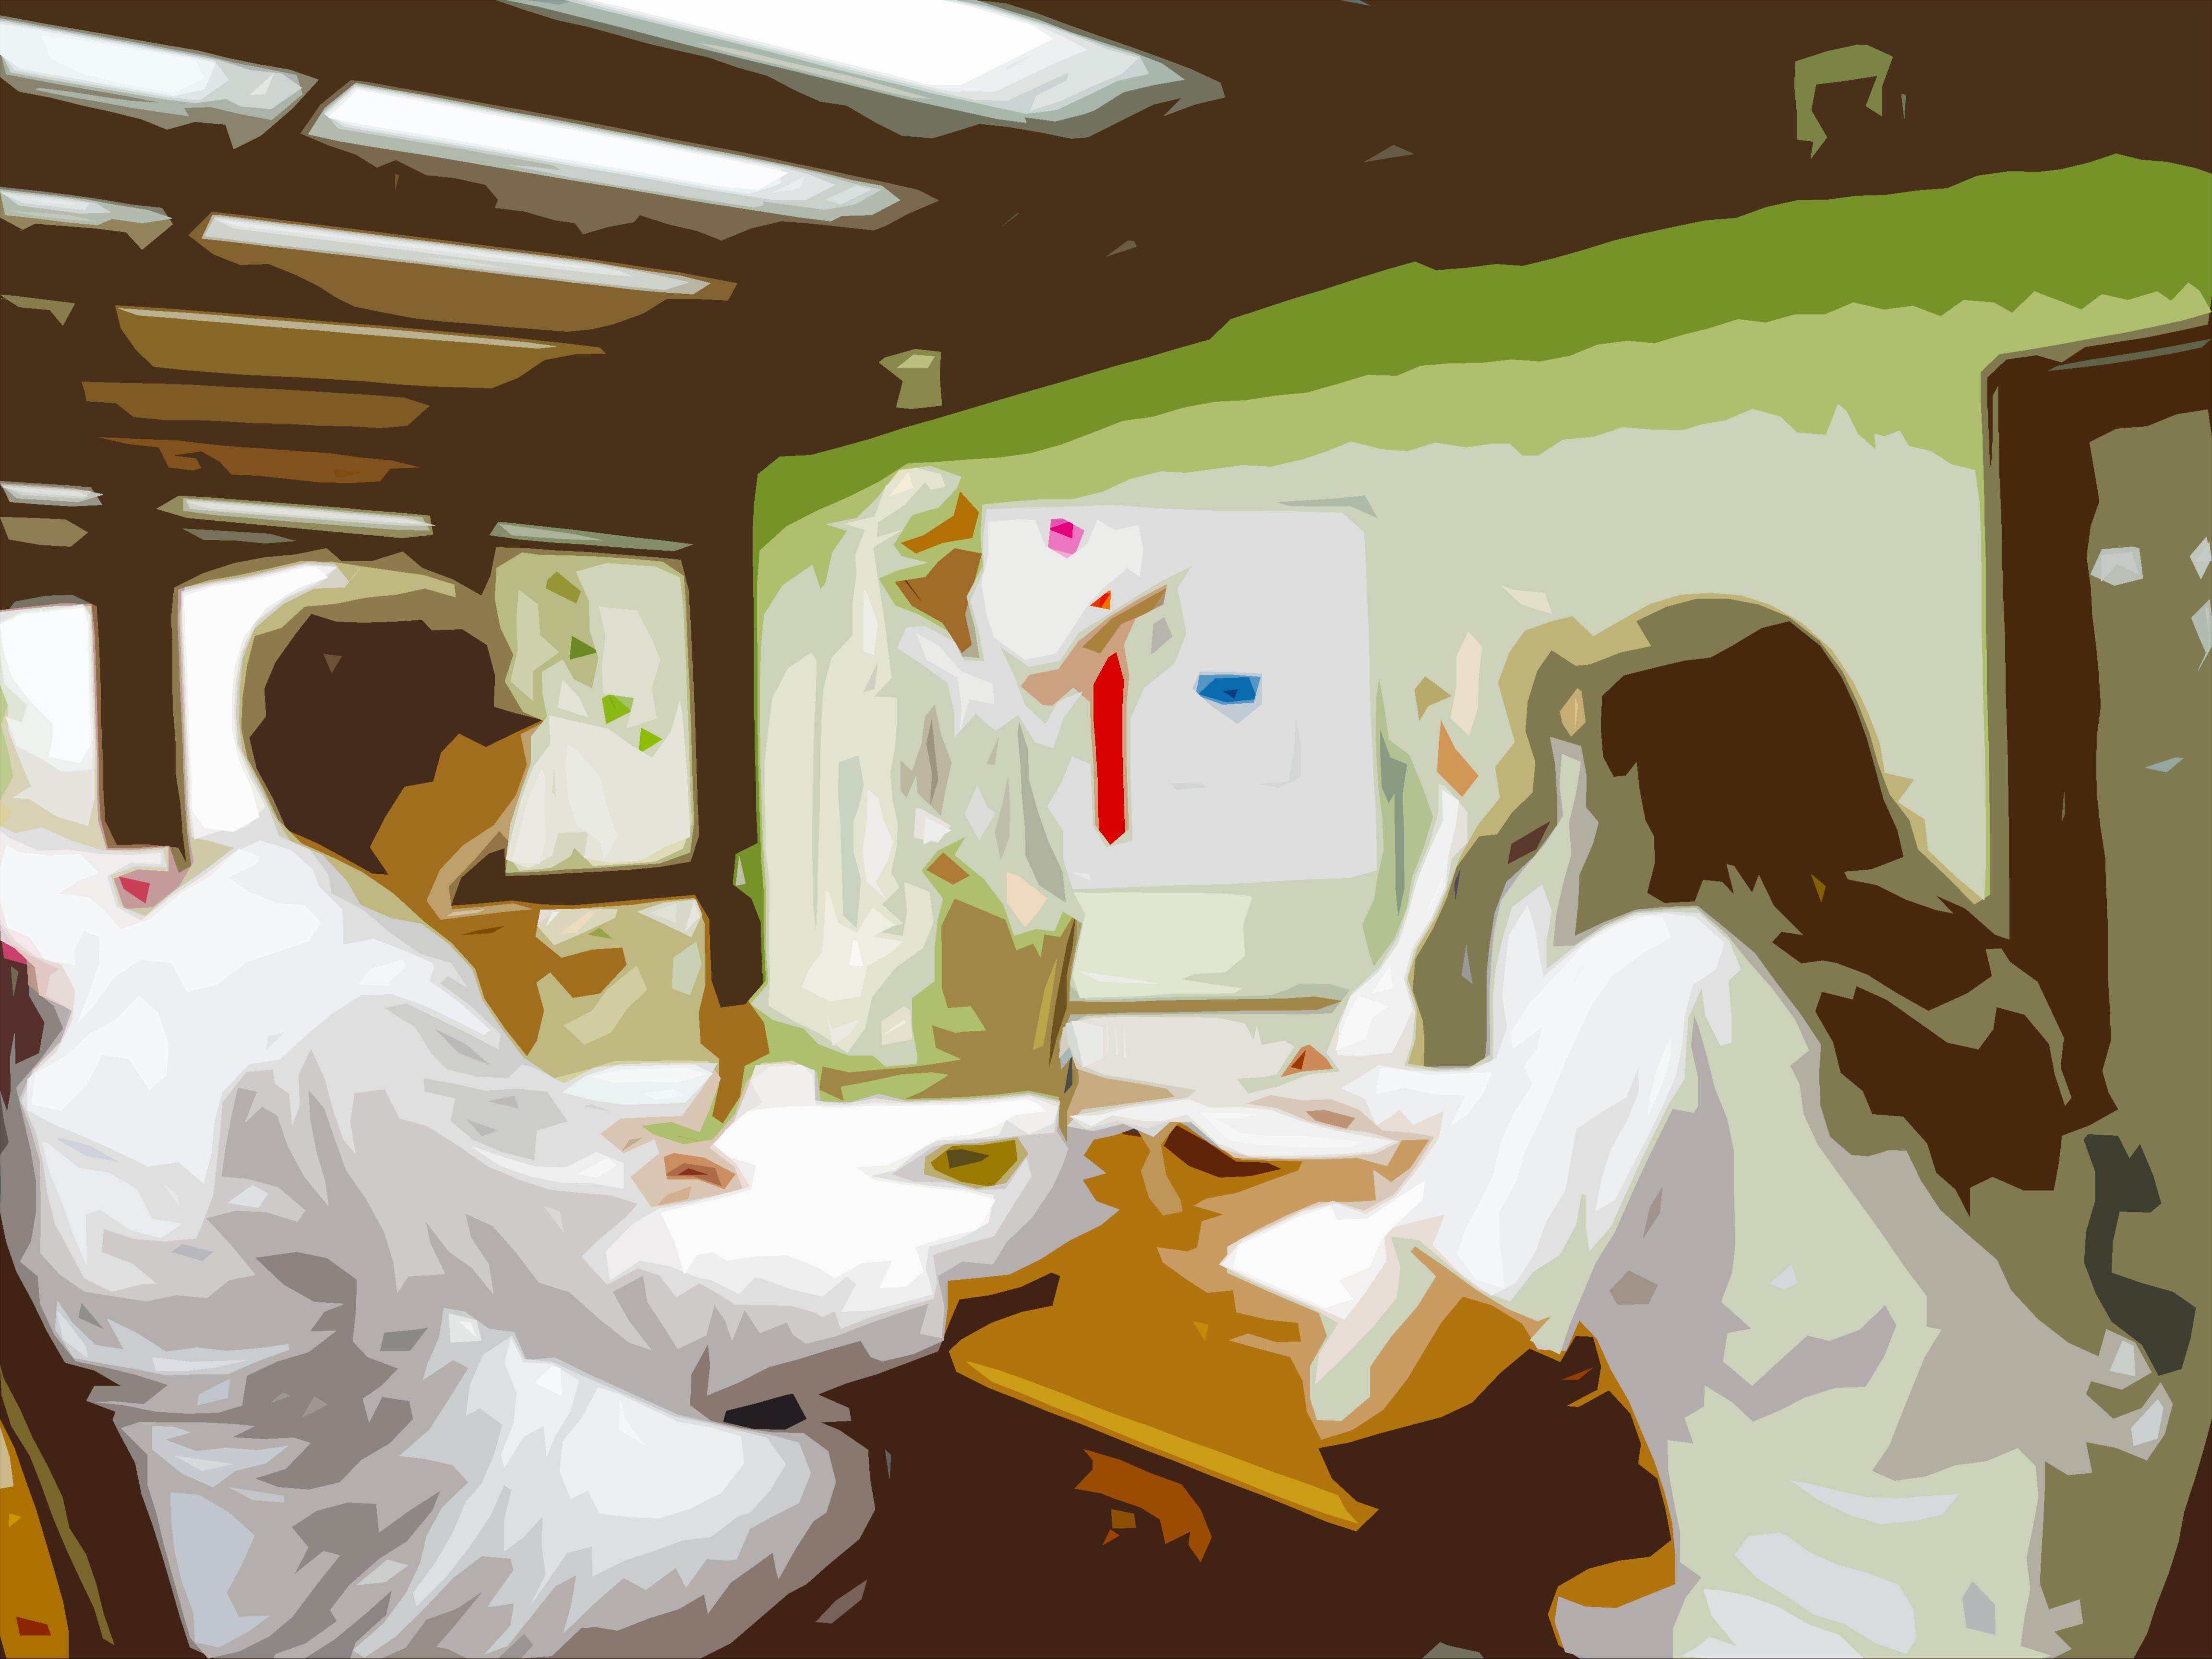 art-praxis-medicalpool-007-2.jpg